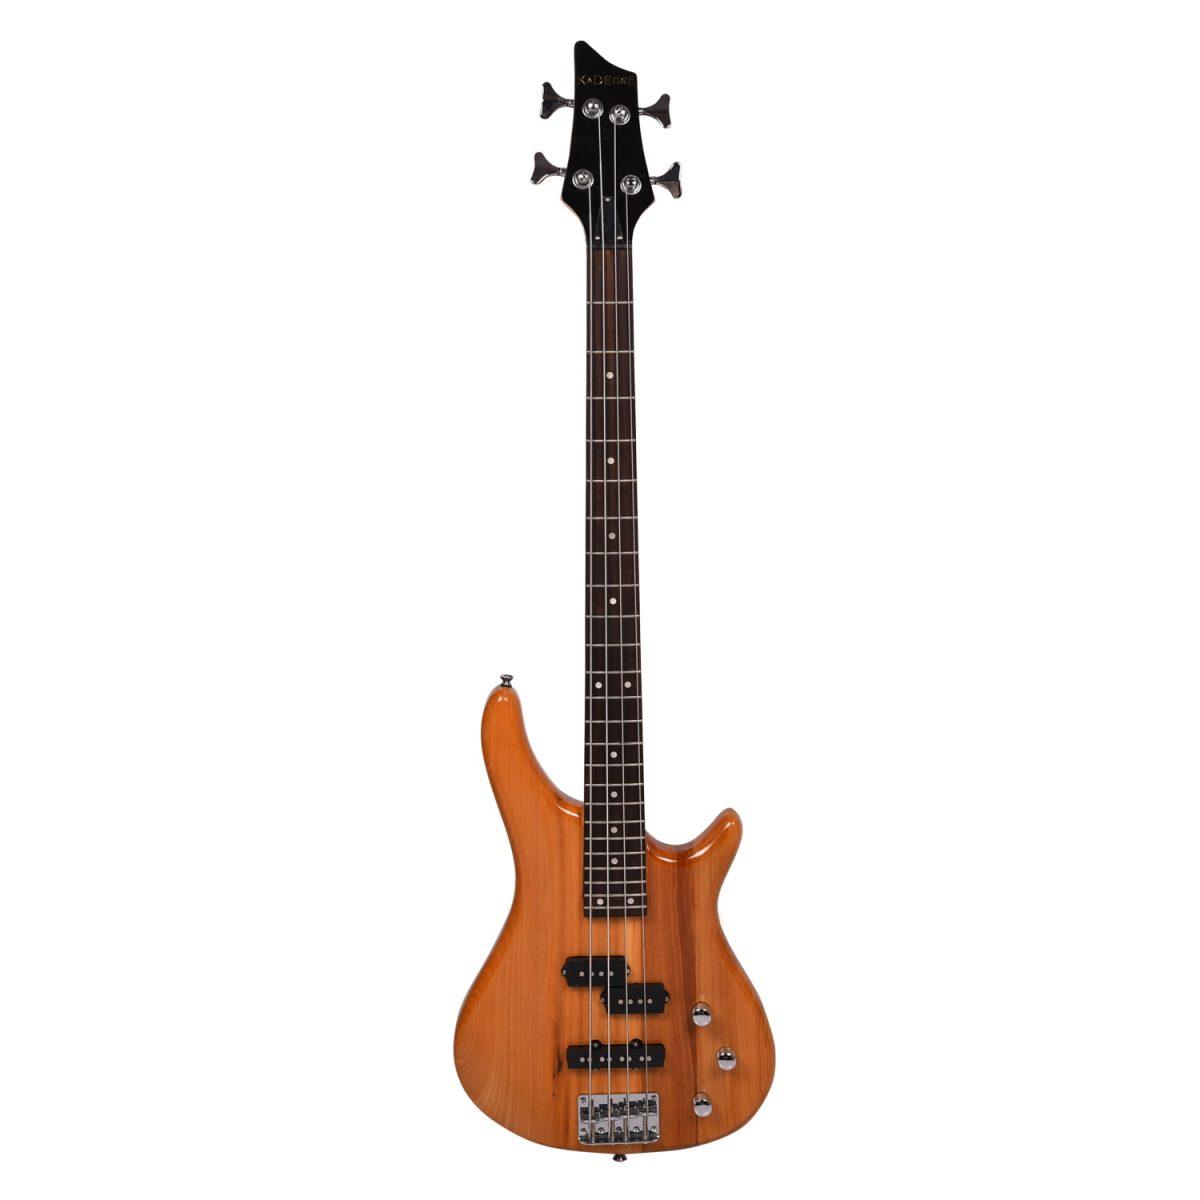 Kadence, Chronicle Series Electric Bass Guitar, Alder Wood EB-08